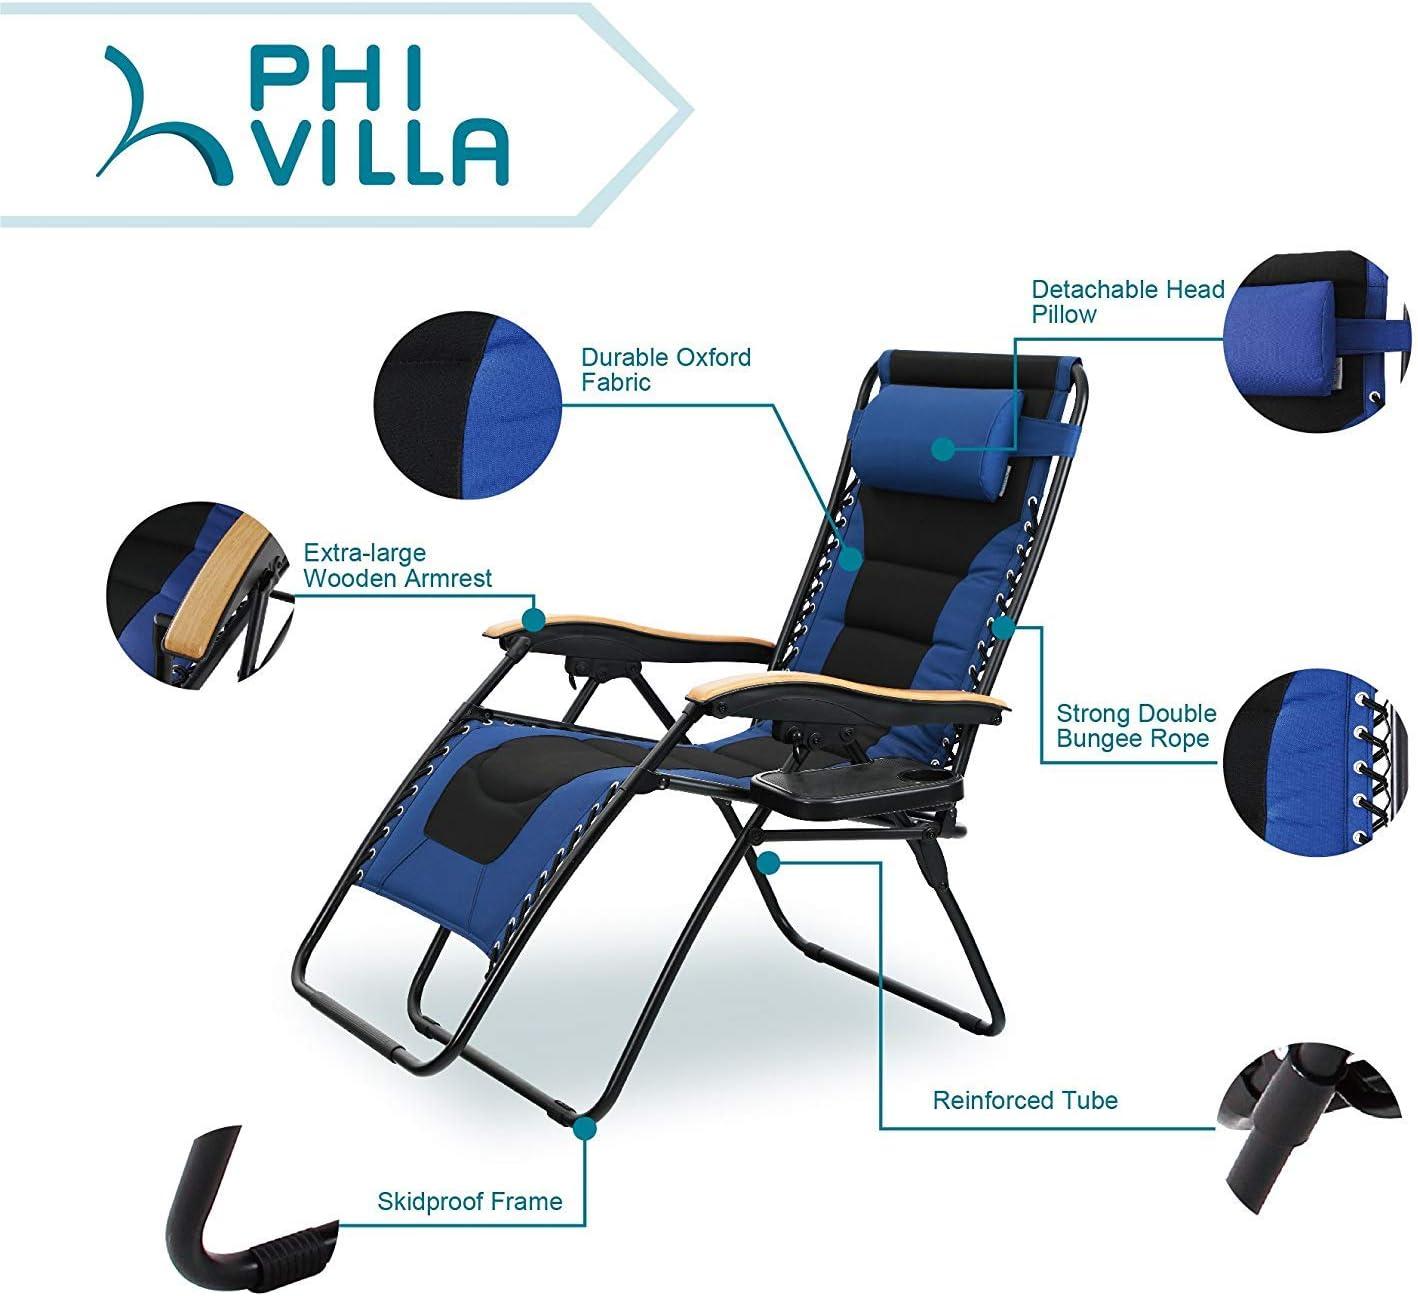 PHI VILLA oversized XL Zero Gravity Lounge Chair